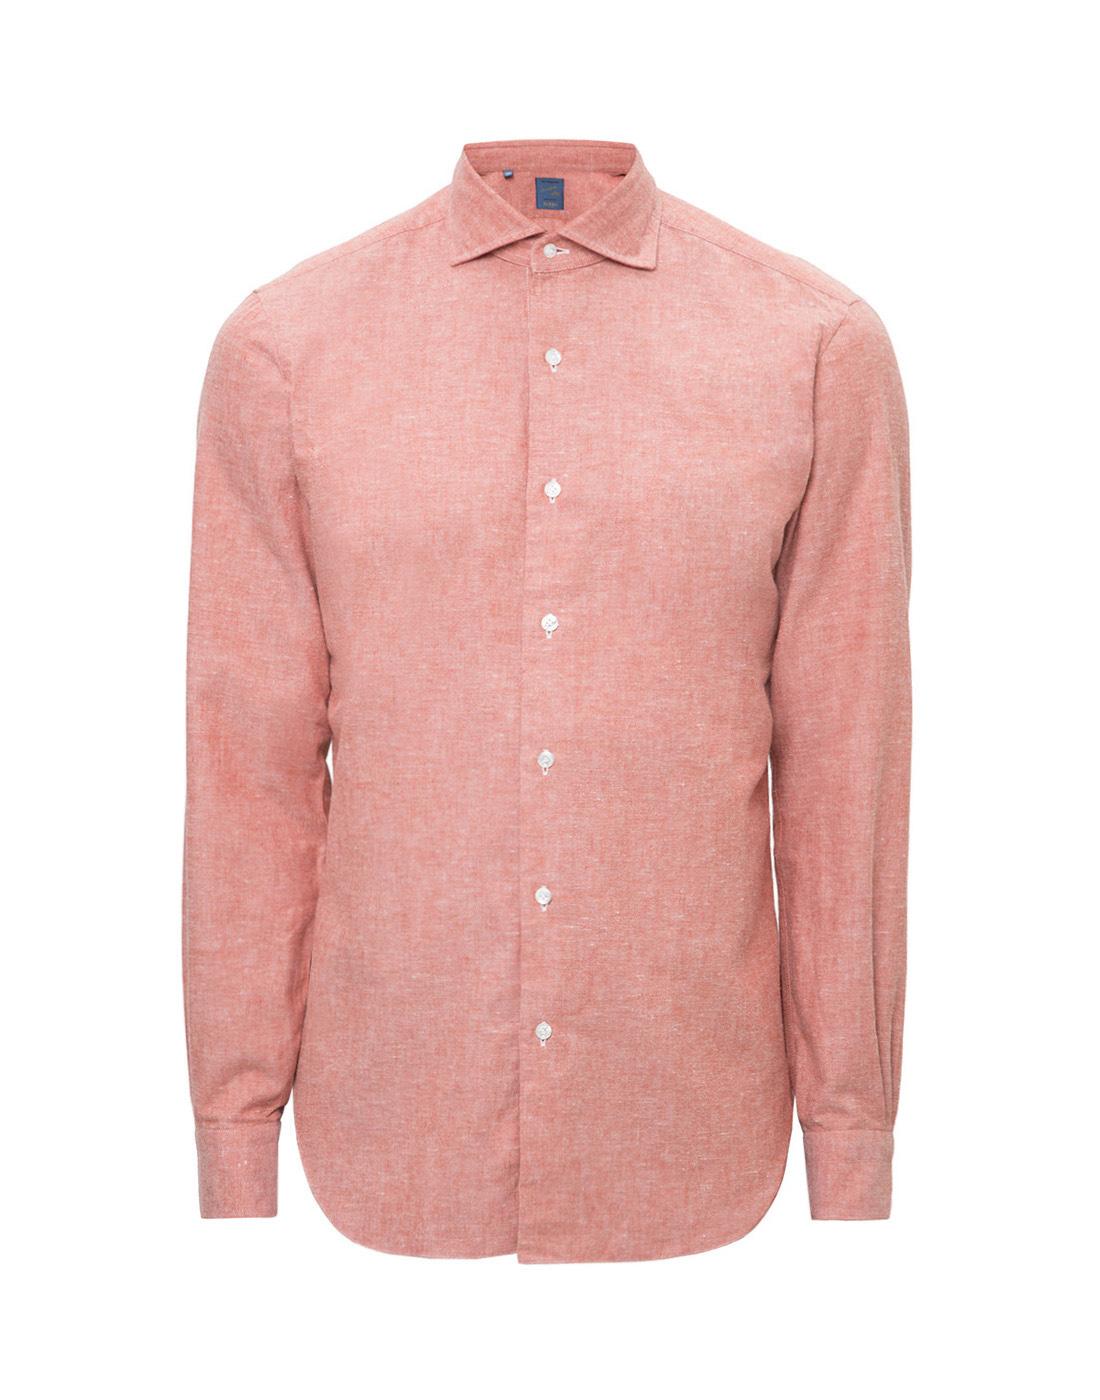 Мужская оранжевая рубашка Barba S556603U-1